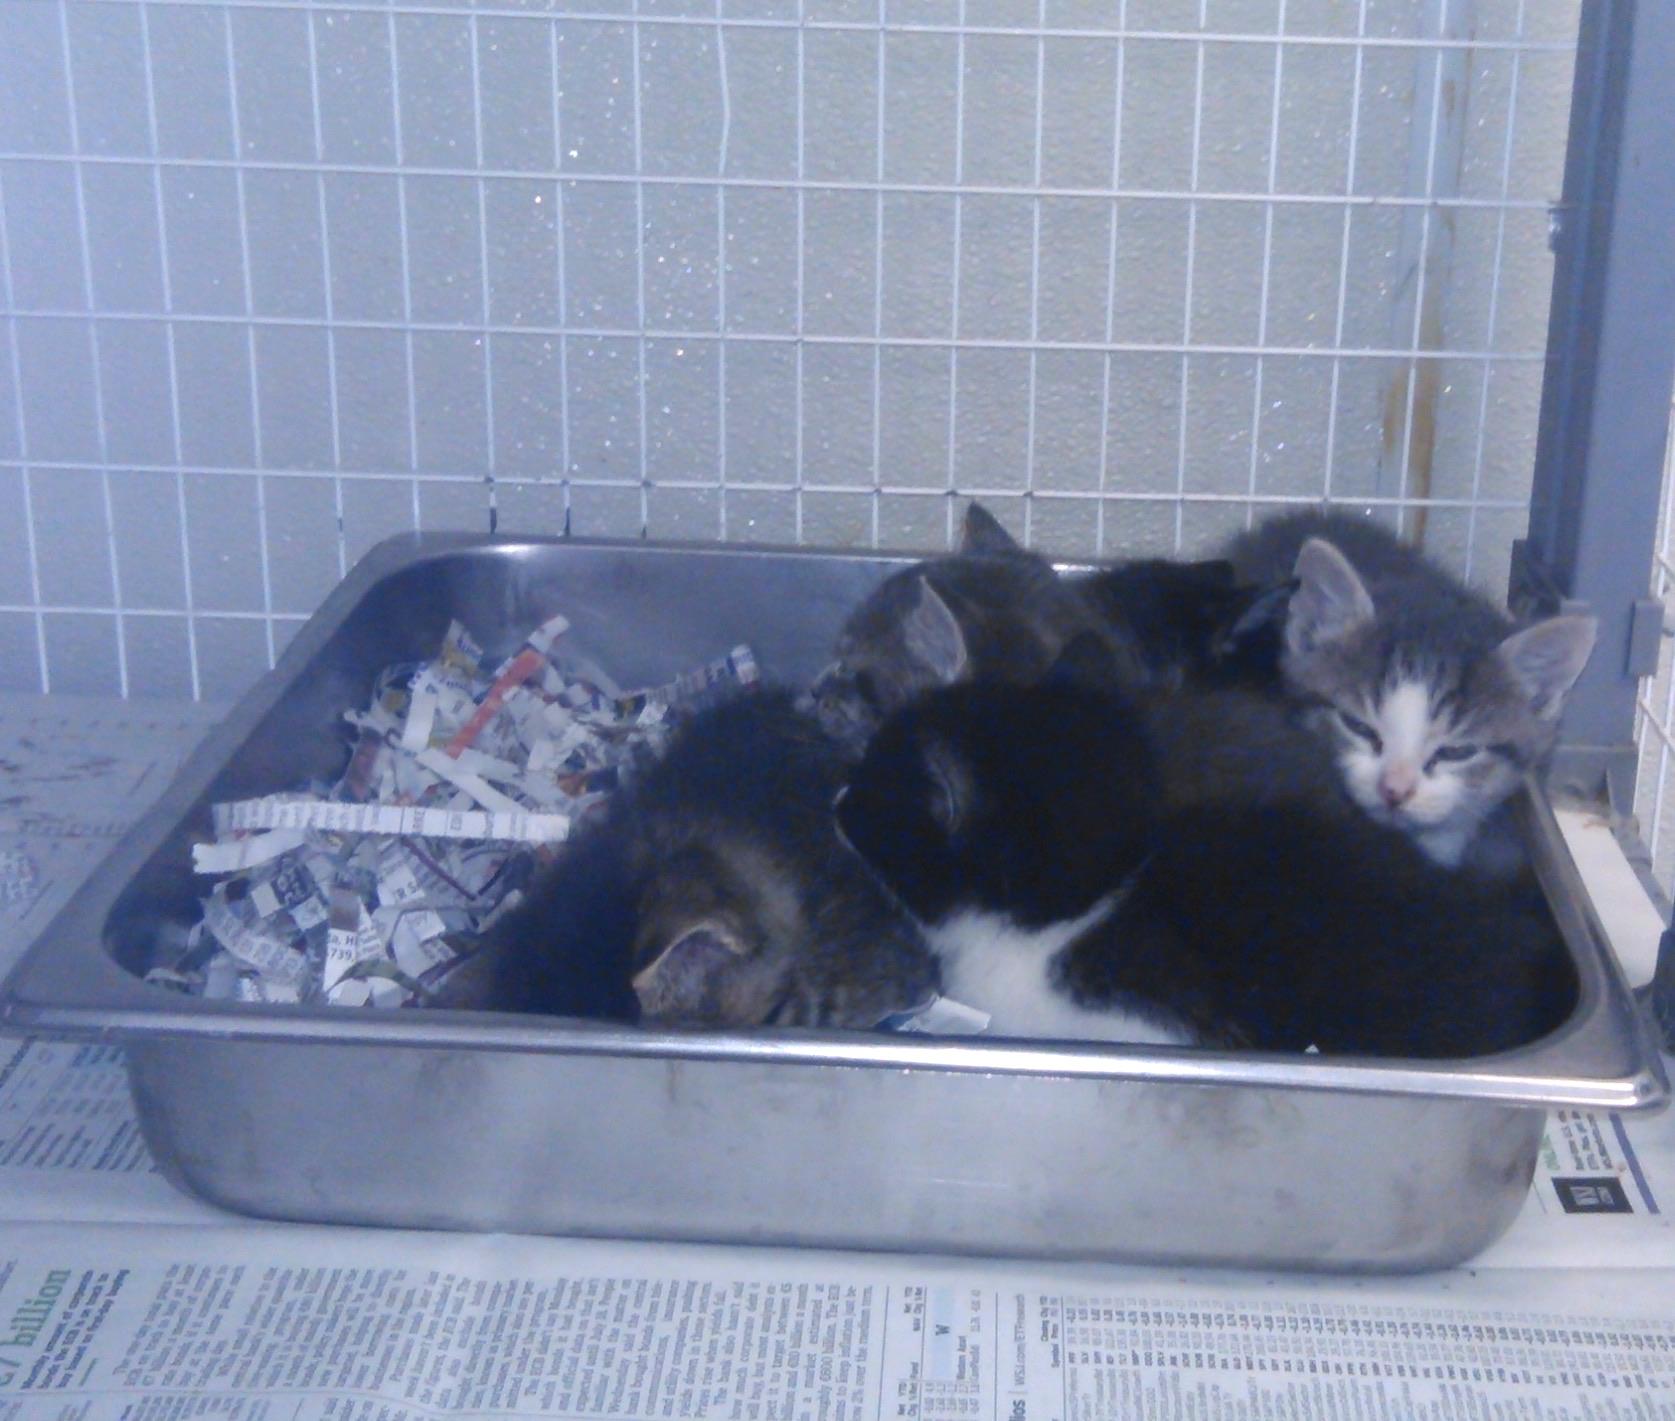 Five fluffy kitties